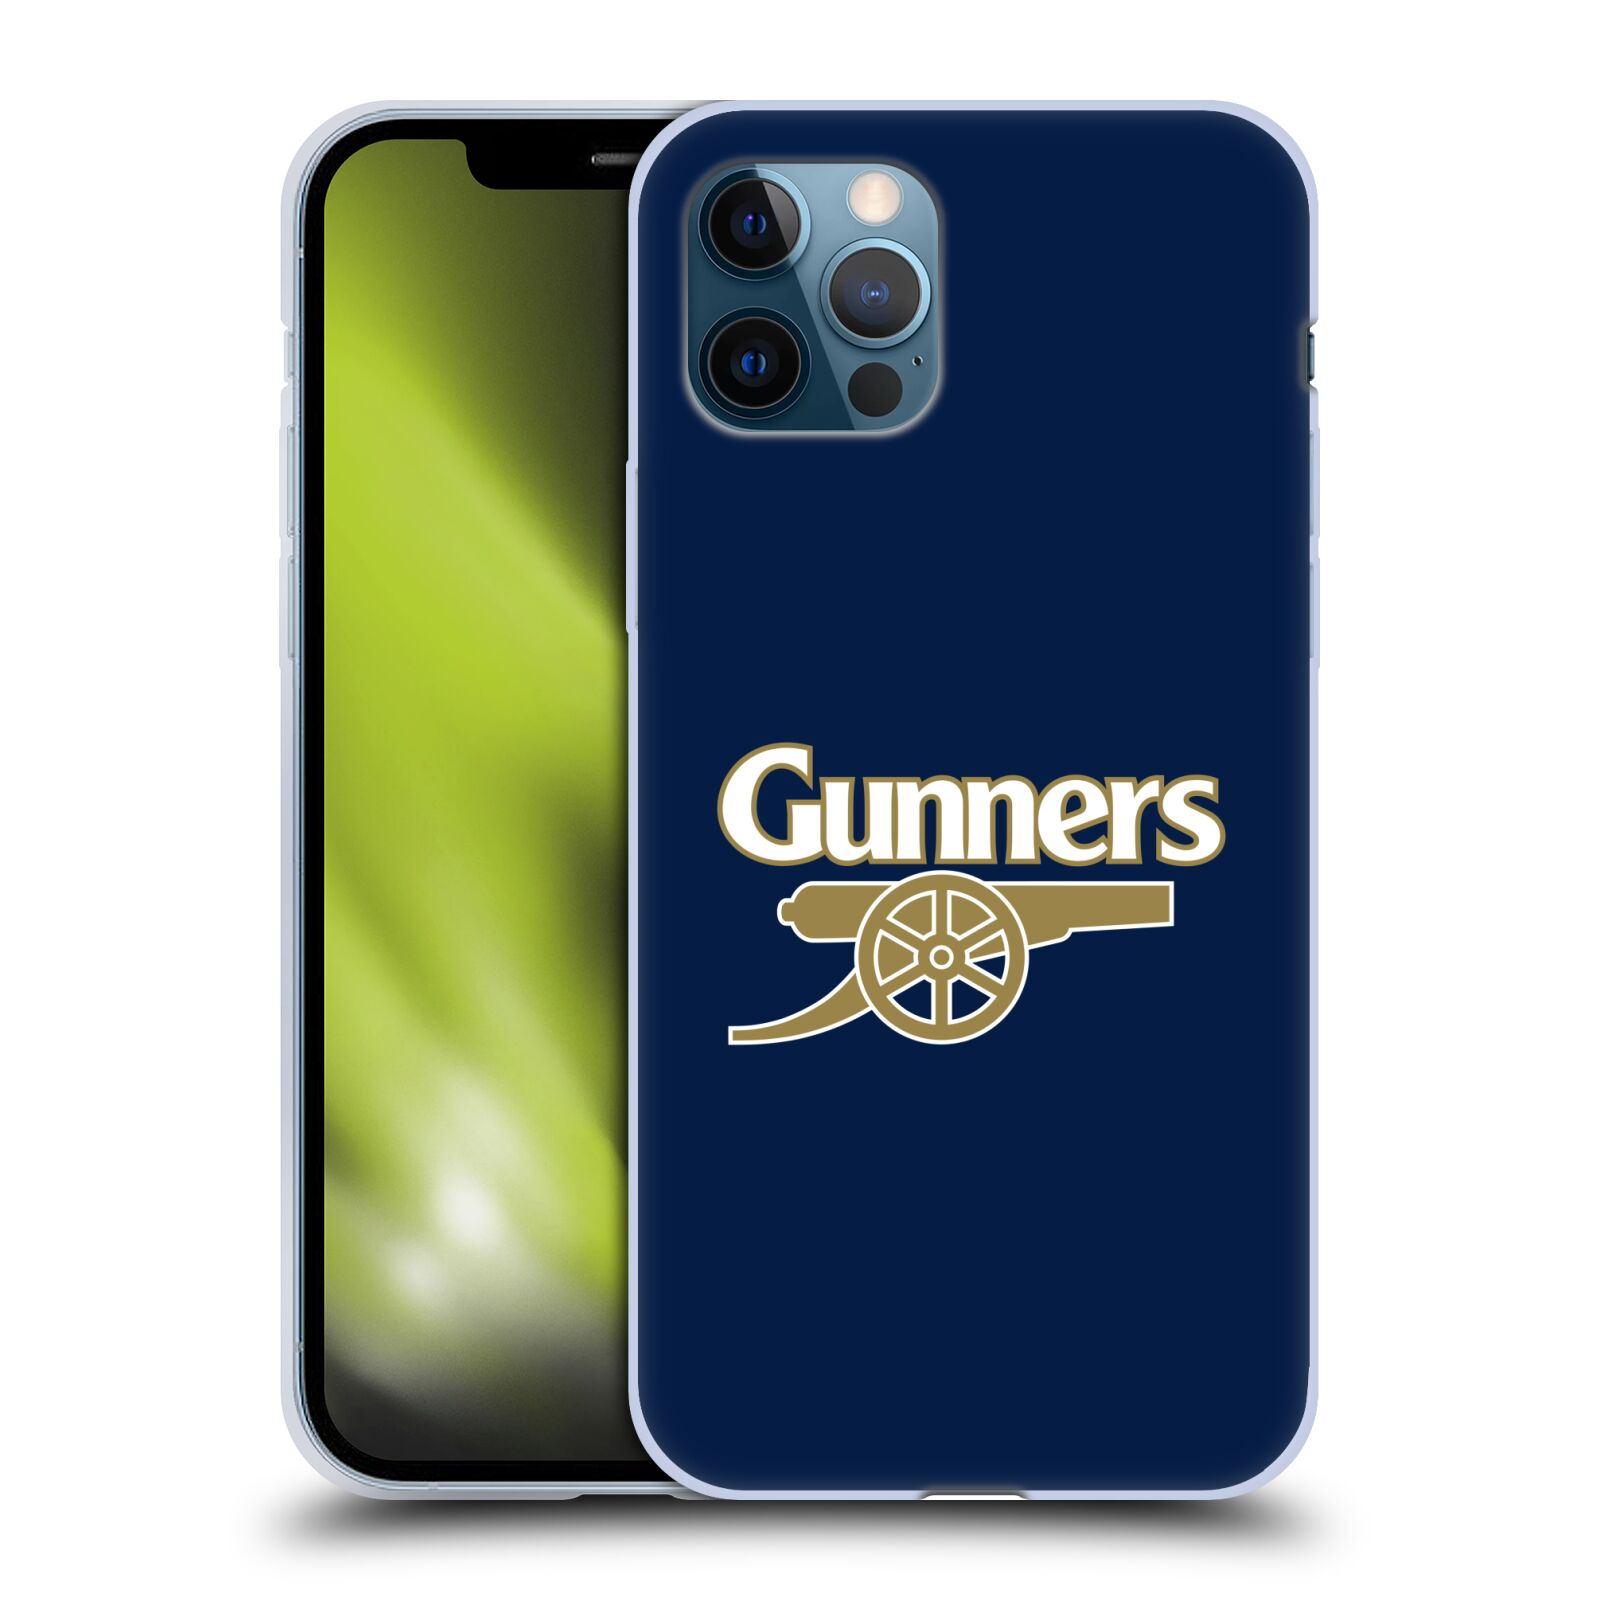 Silikonové pouzdro na mobil Apple iPhone 12 / 12 Pro - Head Case - Arsenal FC - Gunners